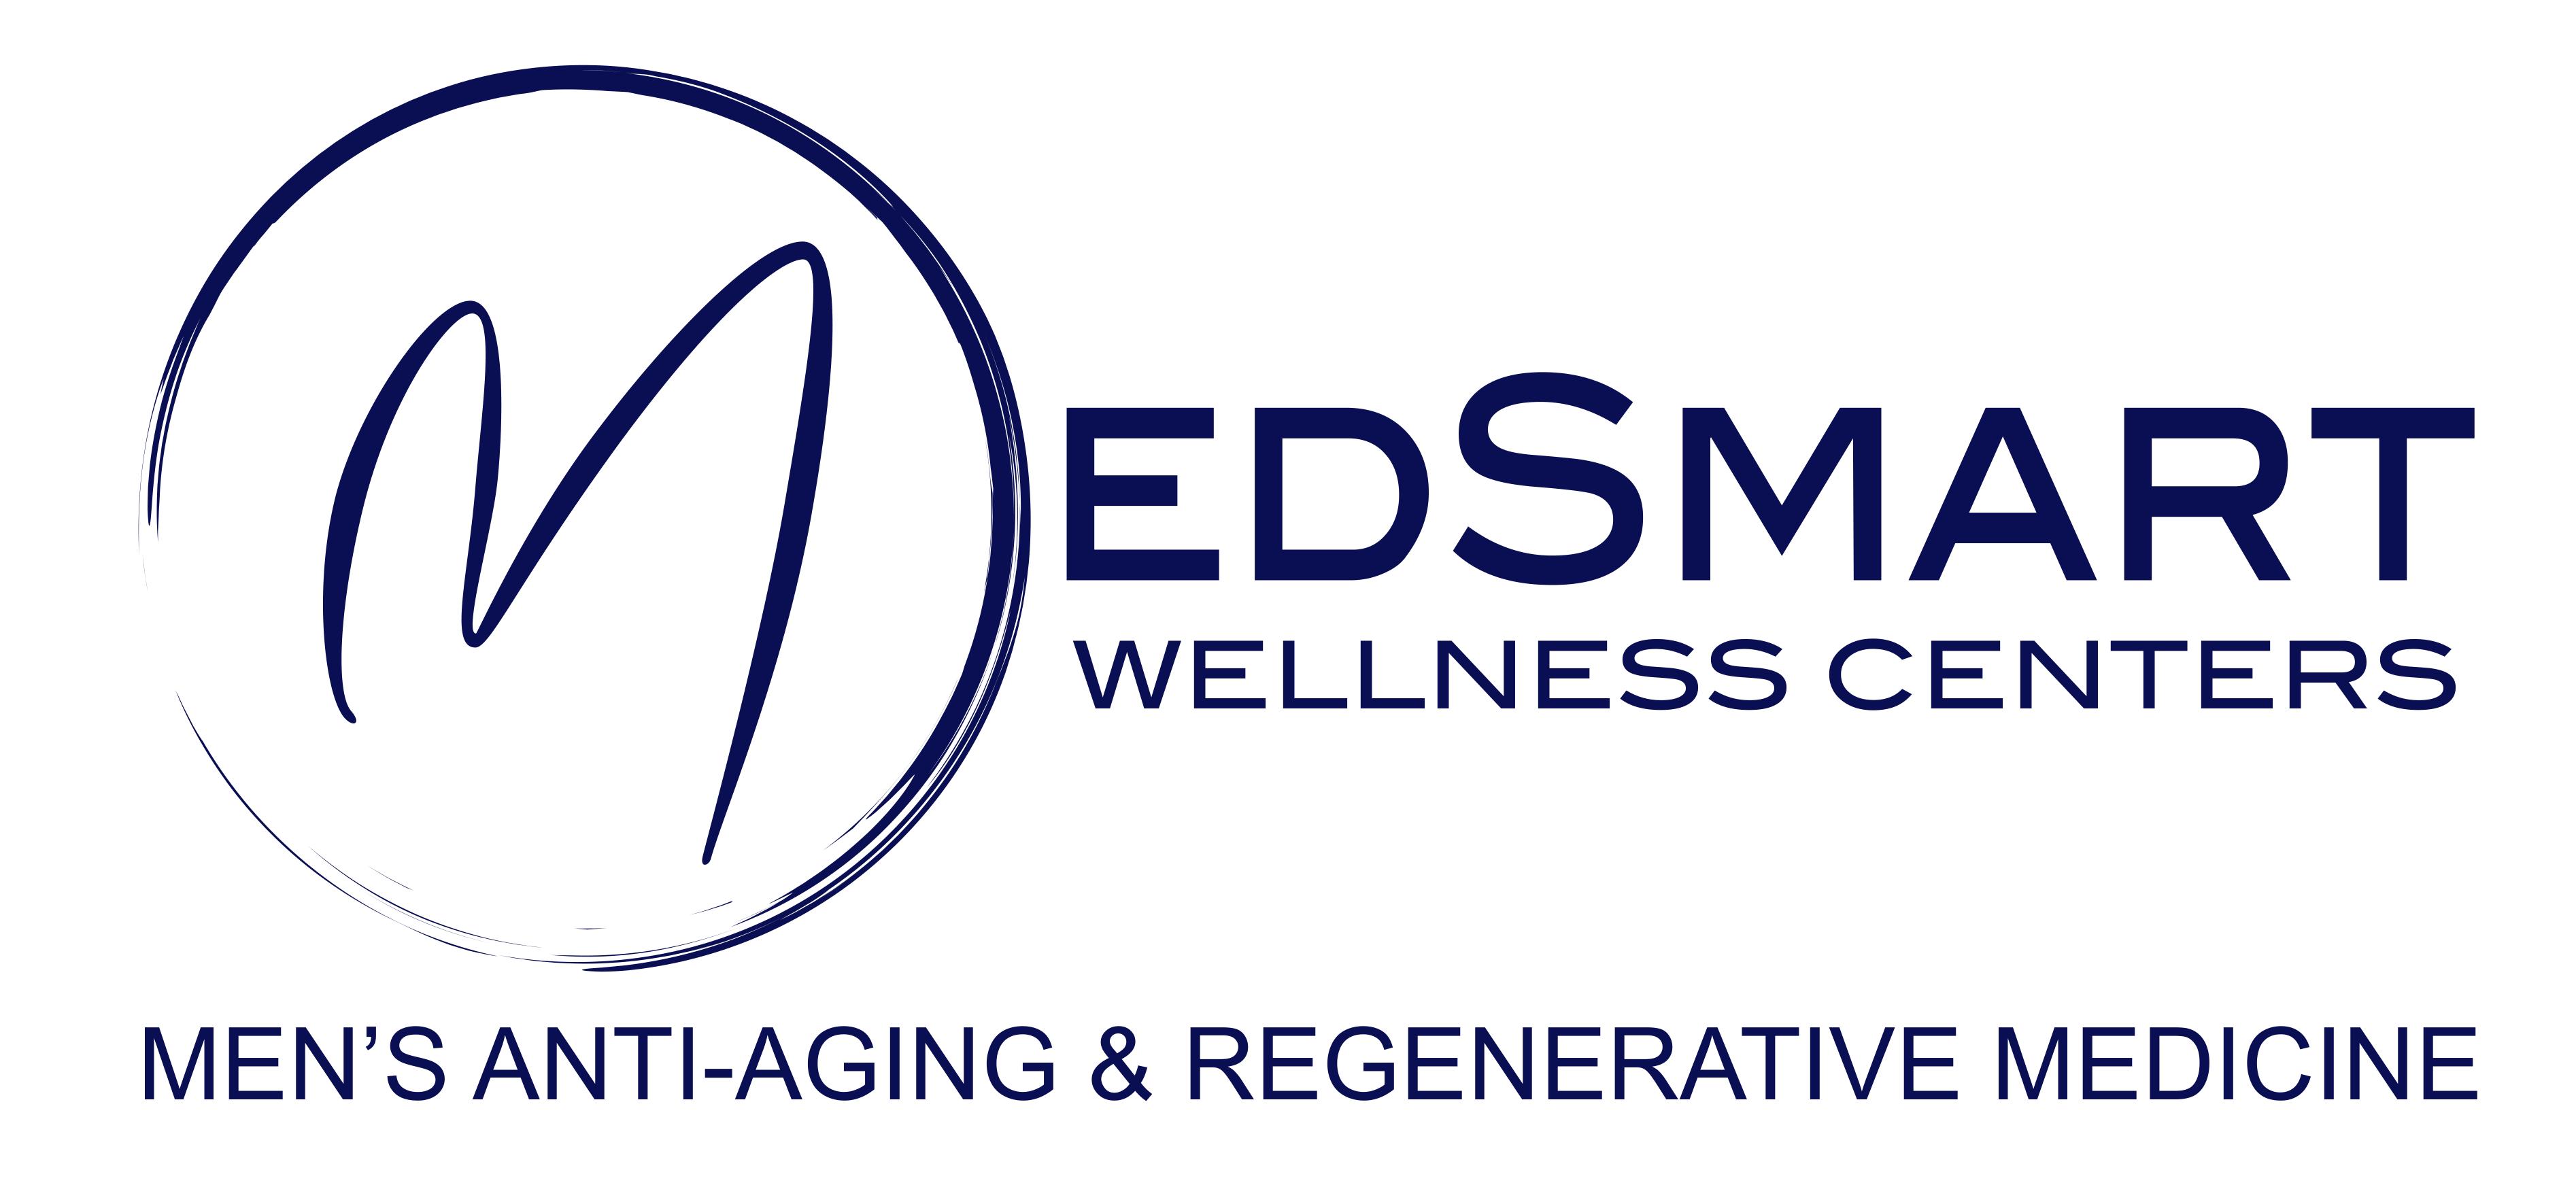 MedSmart Wellness Centers Inc